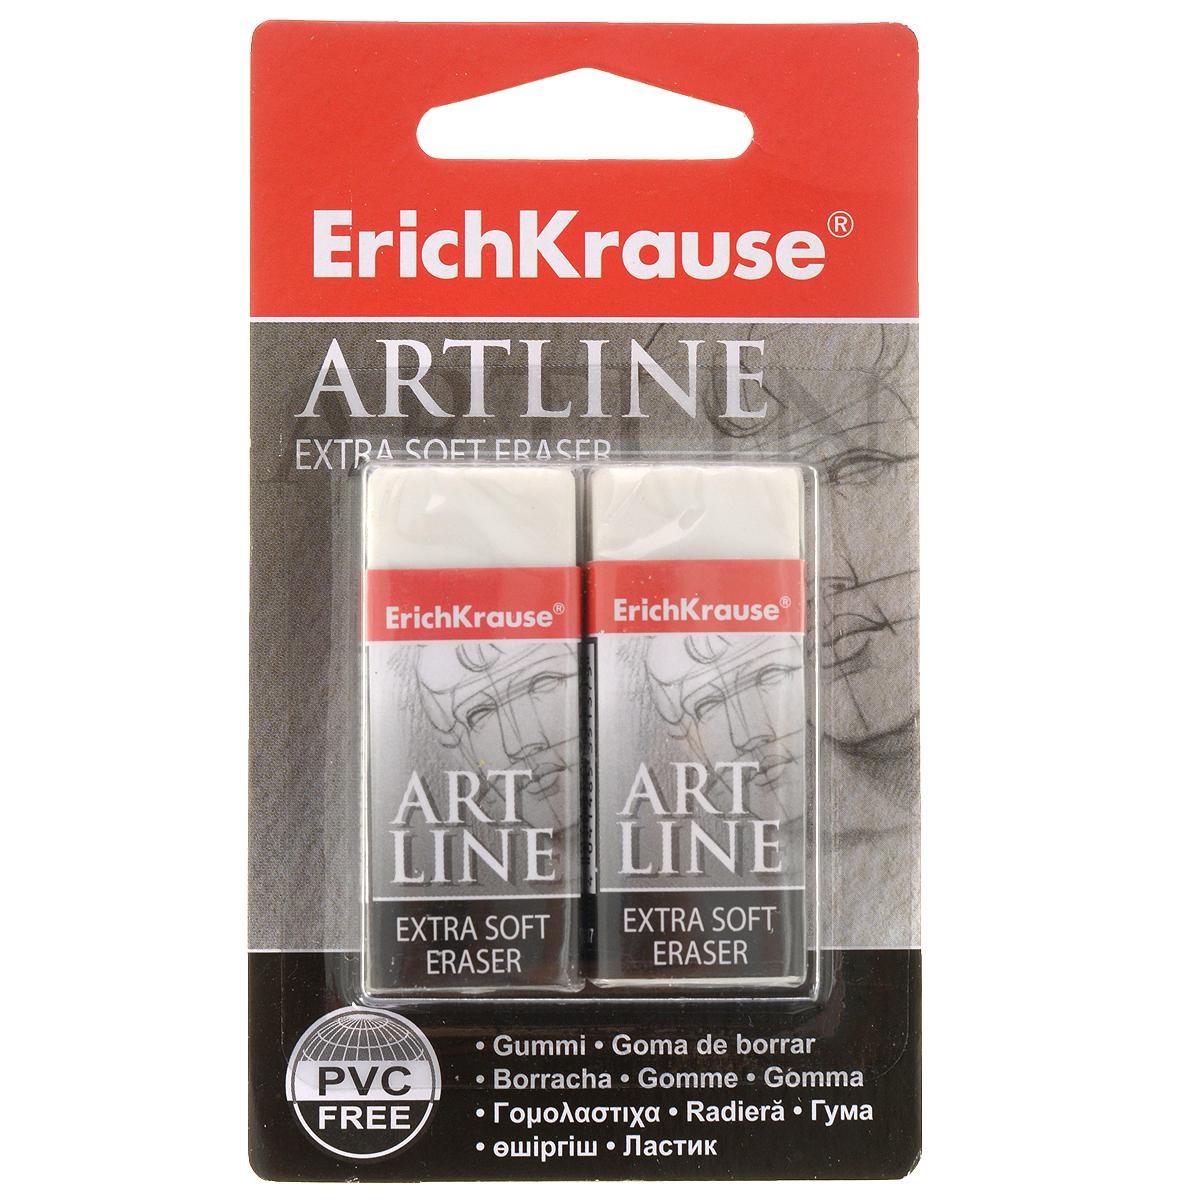 Набор ластиков Erich Krause Artlane, 2 шт factis набор мягких ластиков цвет белый 2 шт